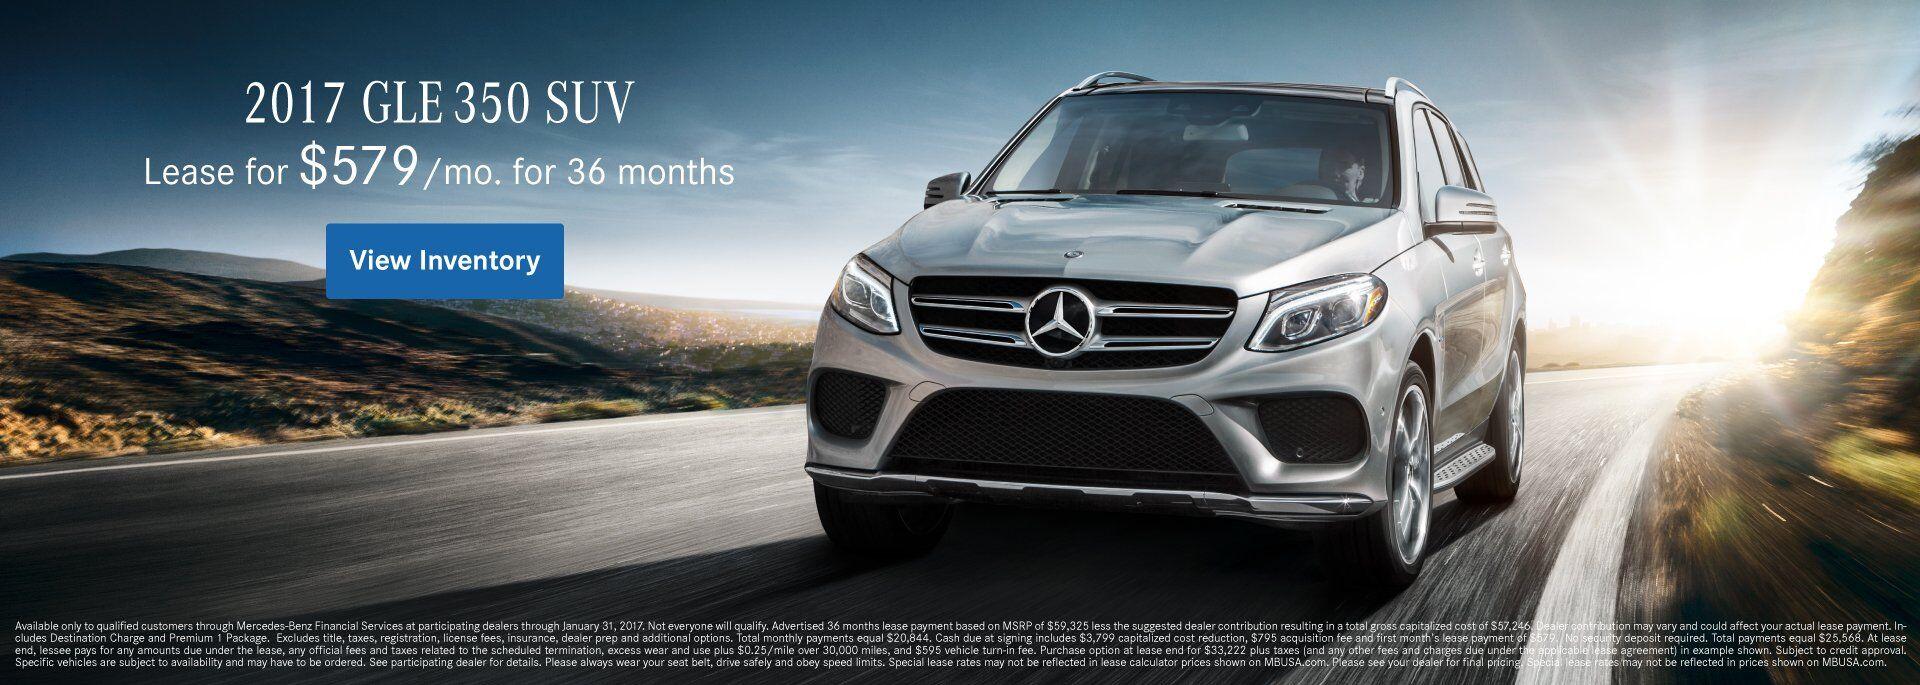 Mercedes benz dealership montgomery al used cars jack for Mercedes benz montgomery alabama